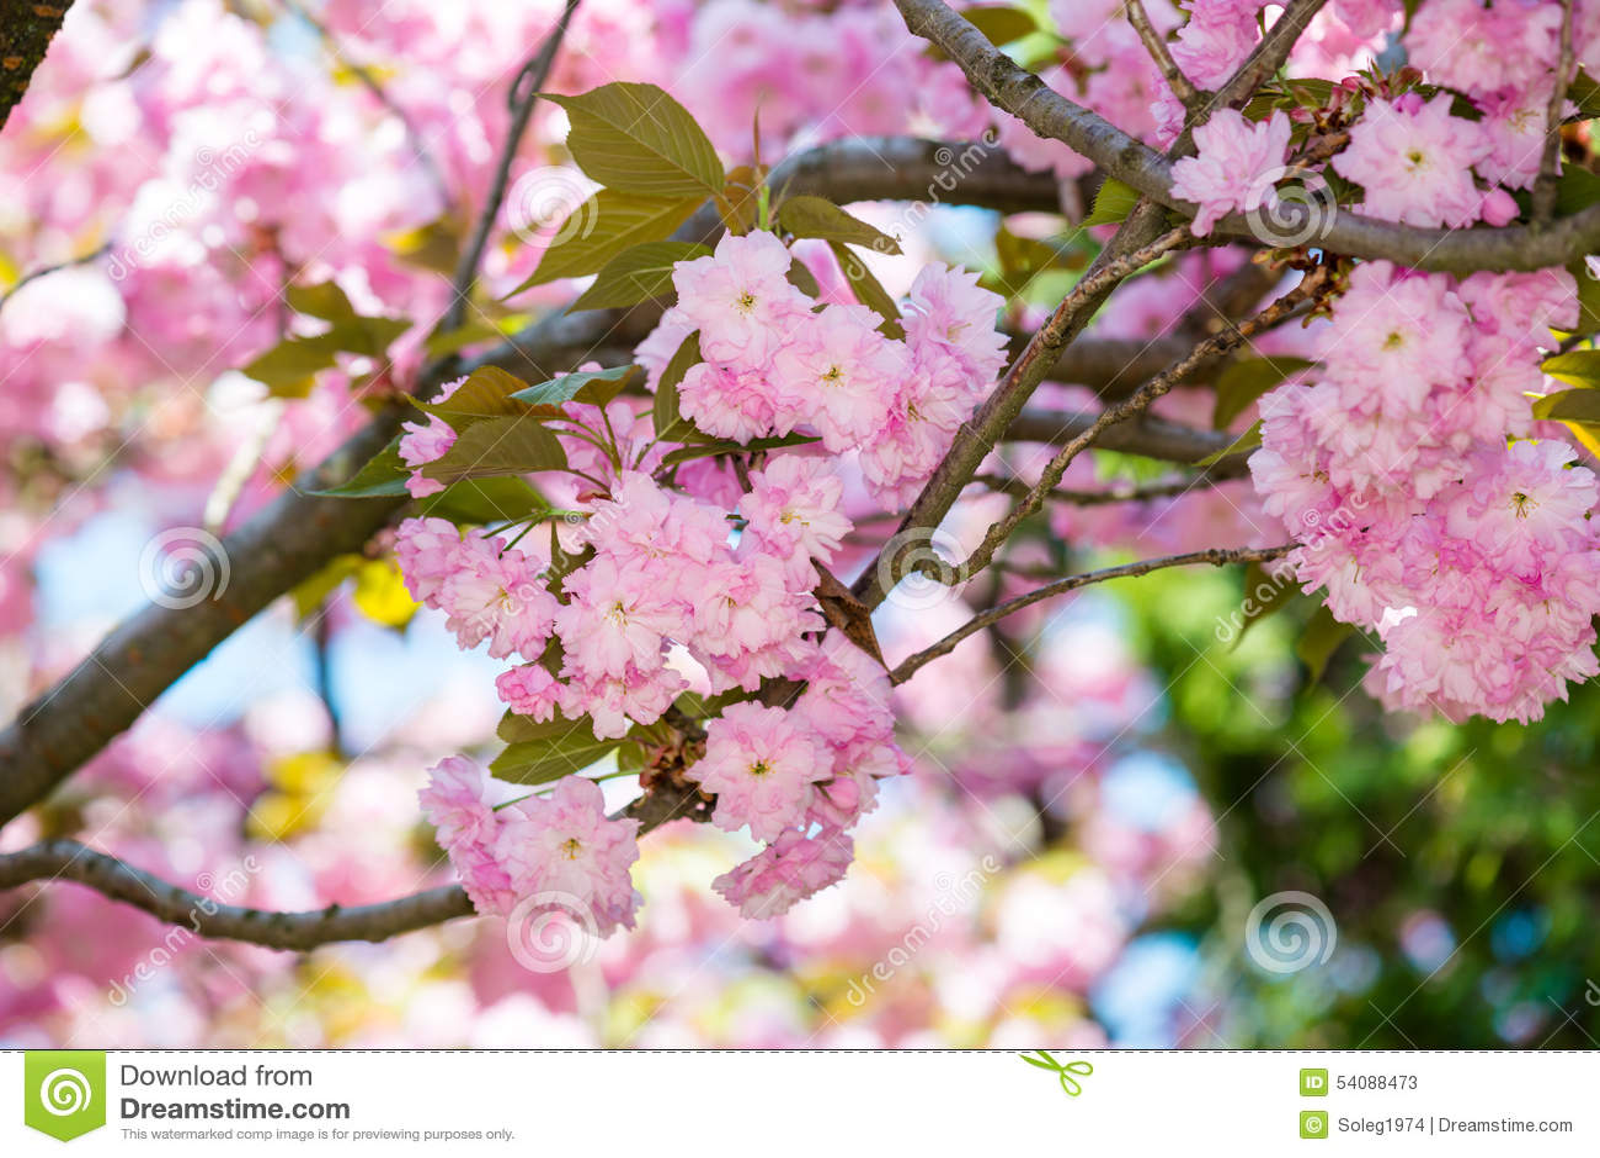 Kersenbloem, bloesem bij de lente